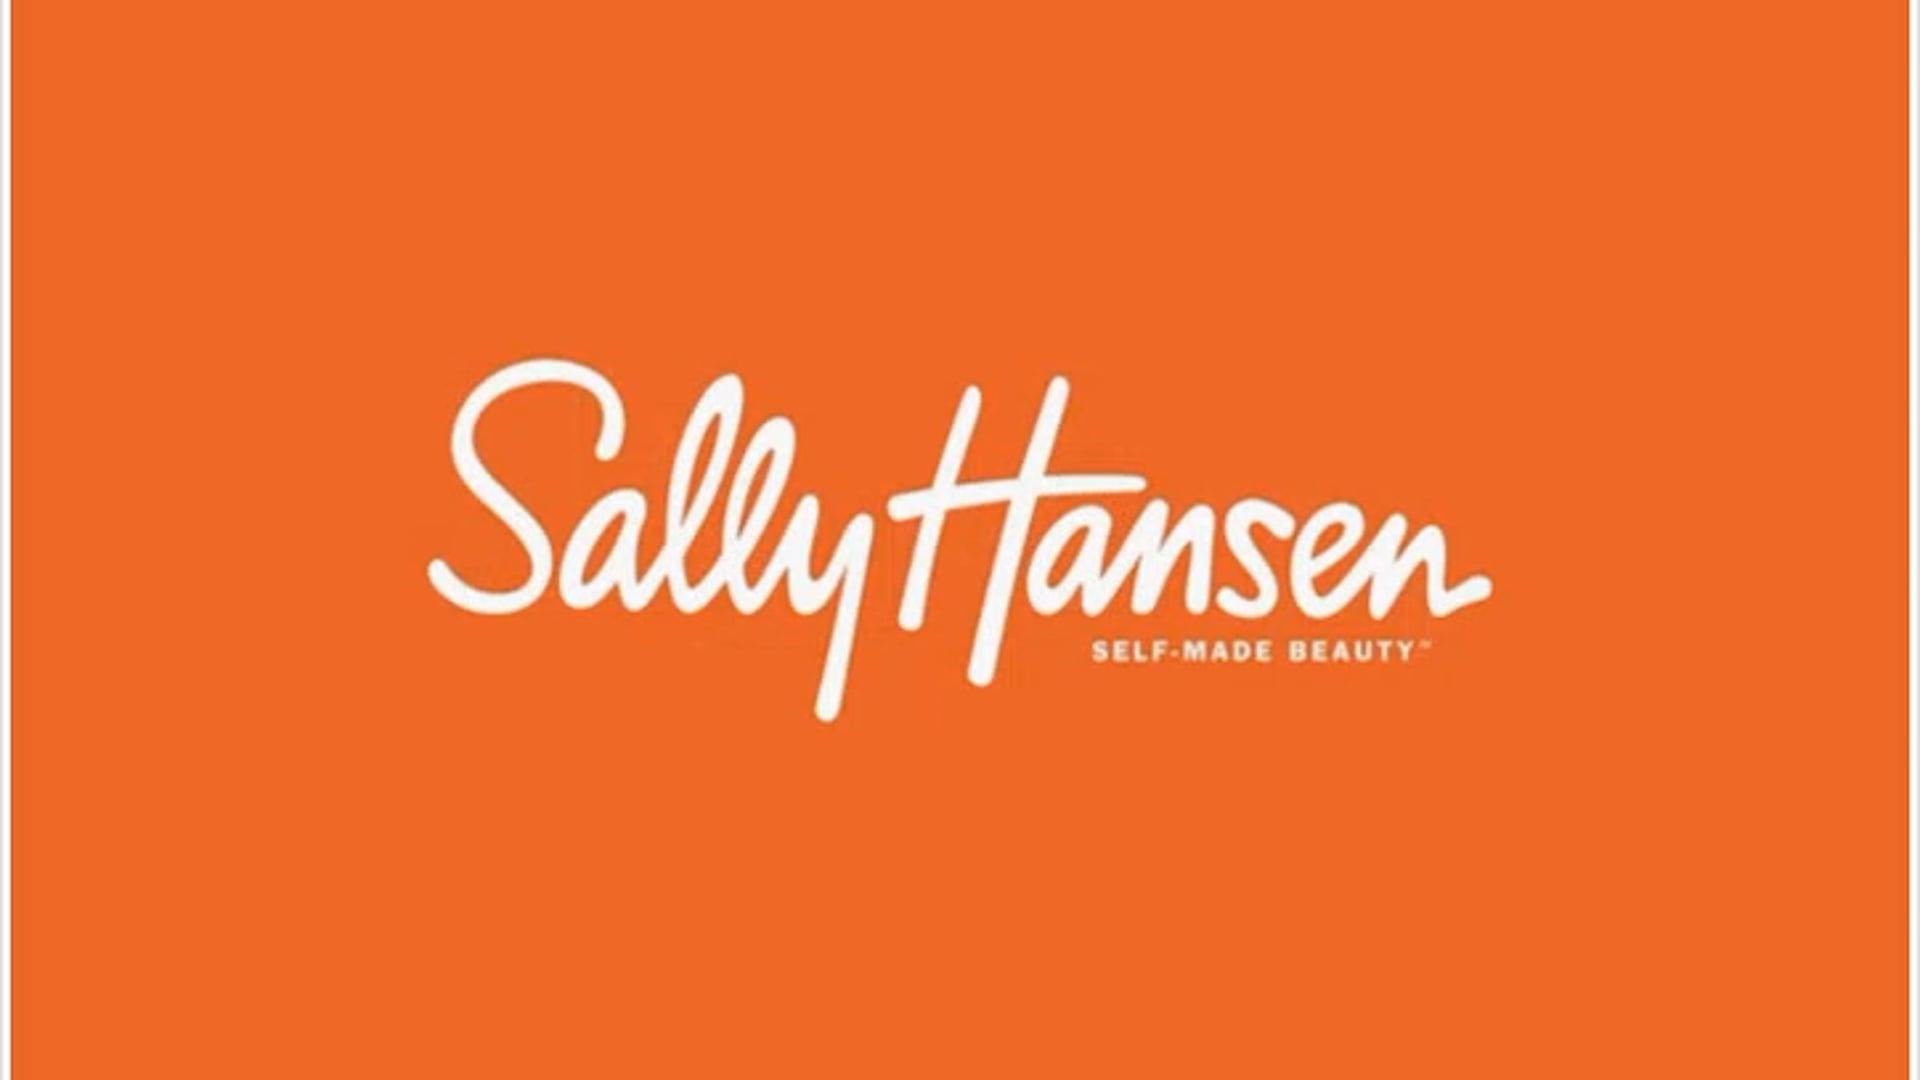 sally-hansen-jamie-nelson-video-director-make-it-rain-green-nail[-polish-money